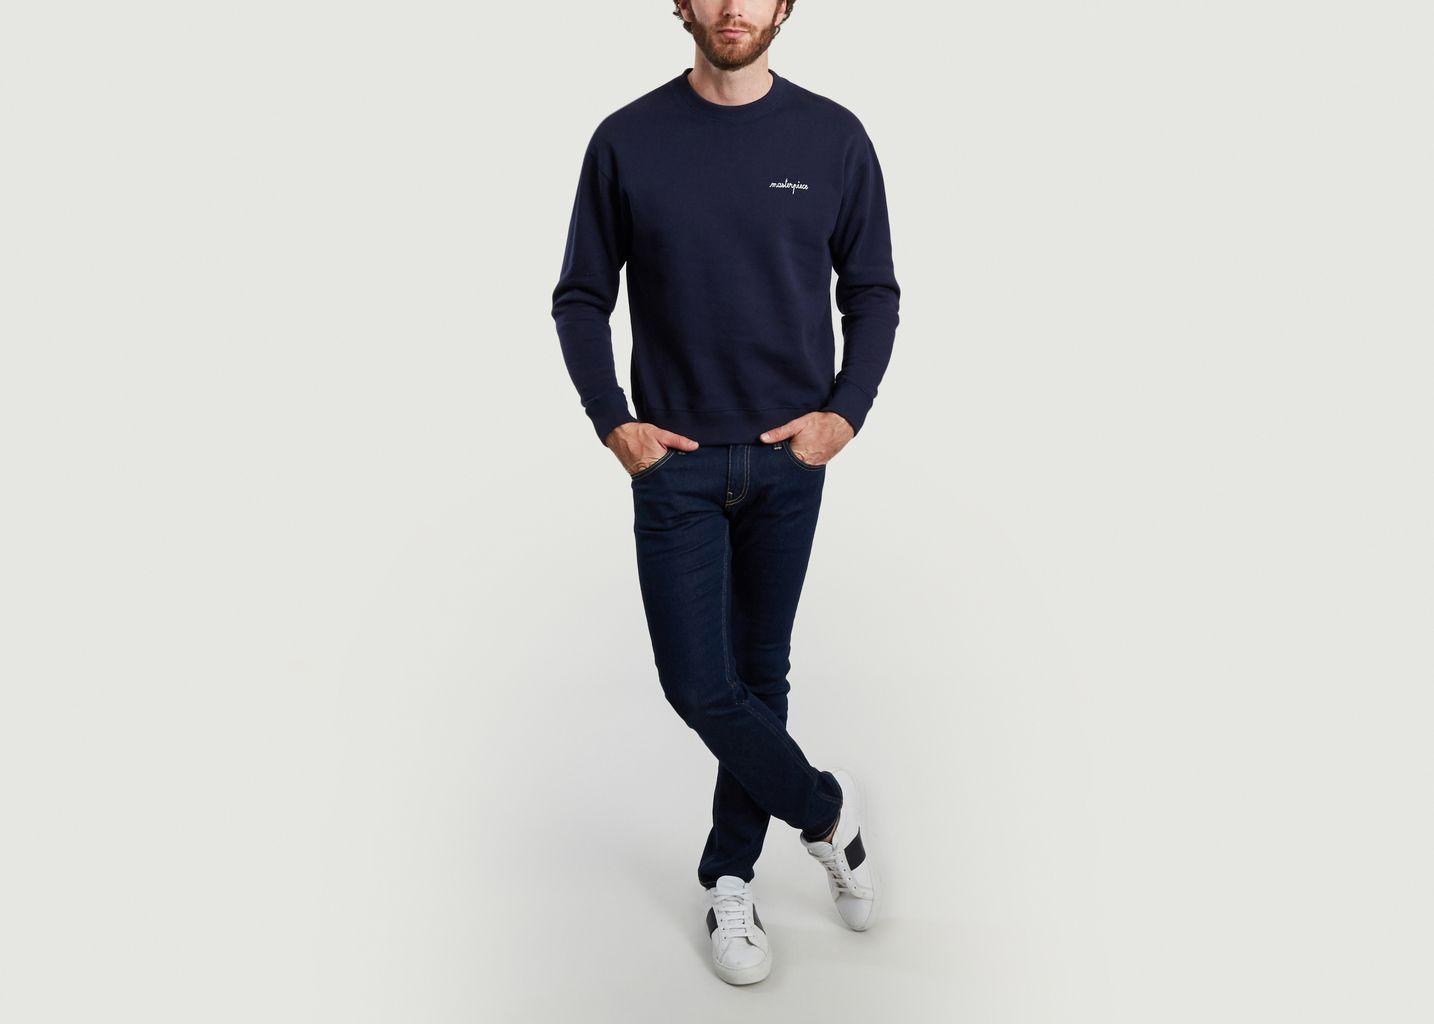 Sweatshirt brodé Masterpiece - Maison Labiche